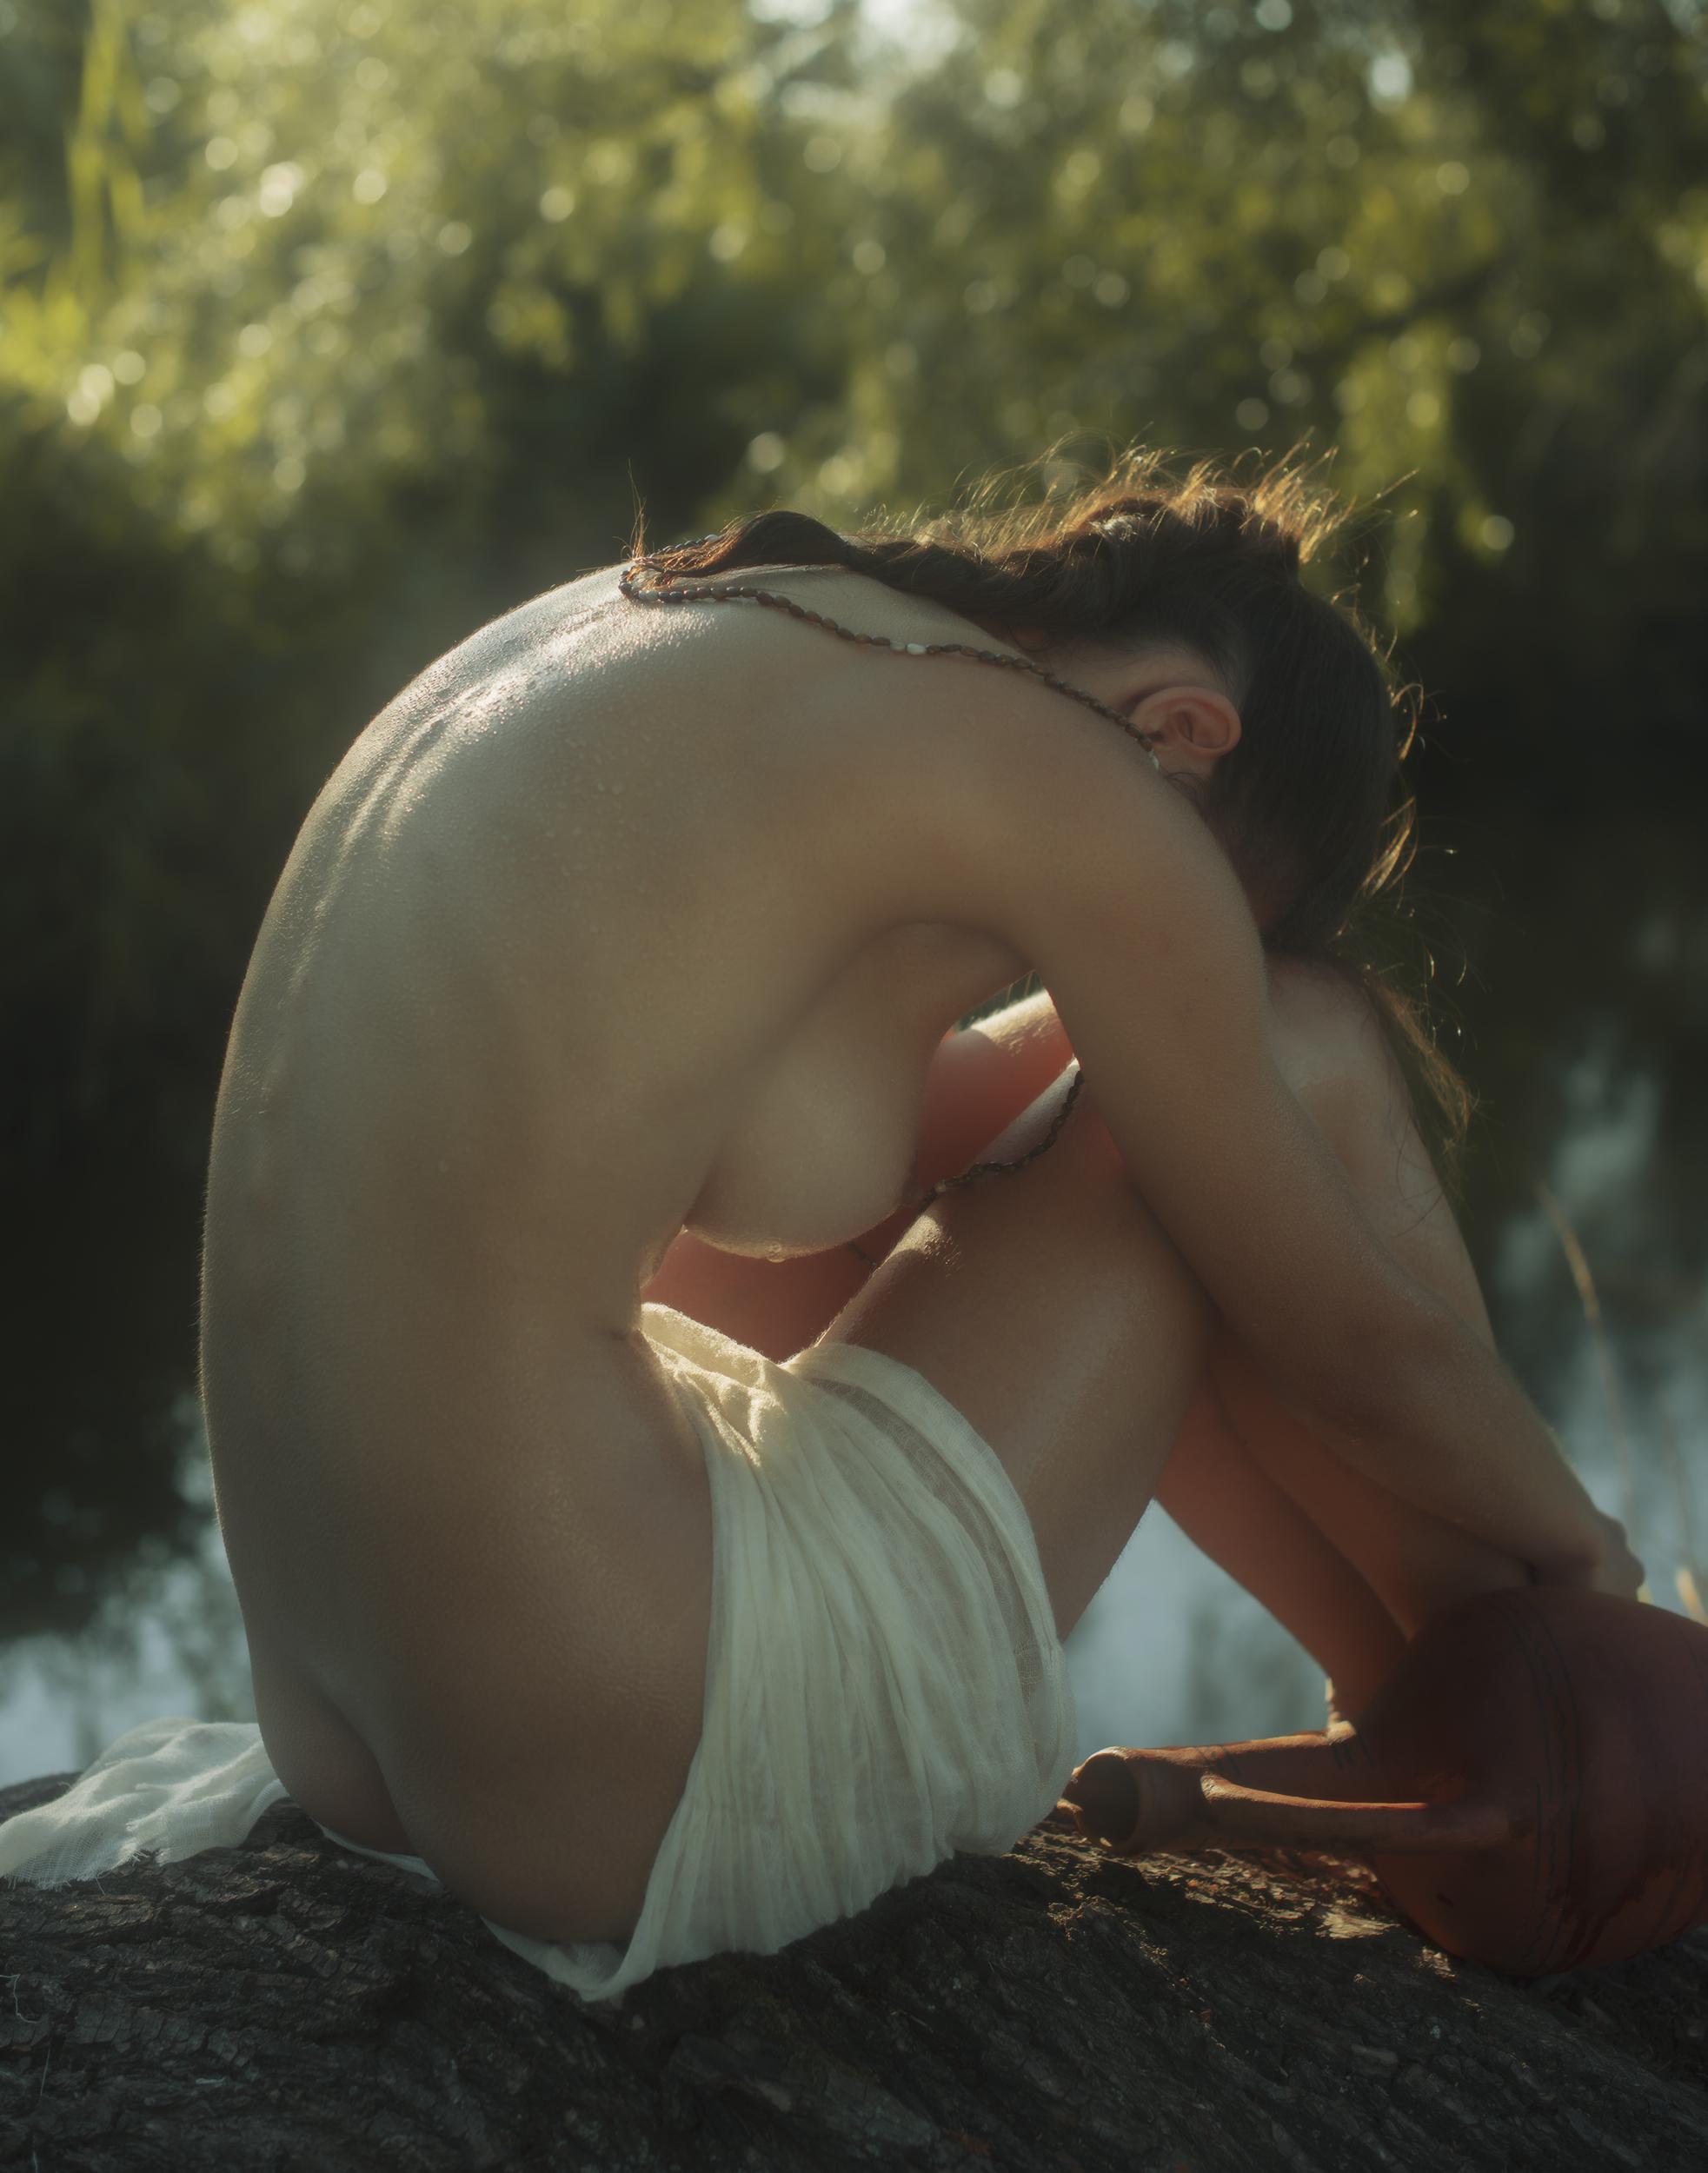 Девушка с кувшином / фотограф Давид Дубницкий